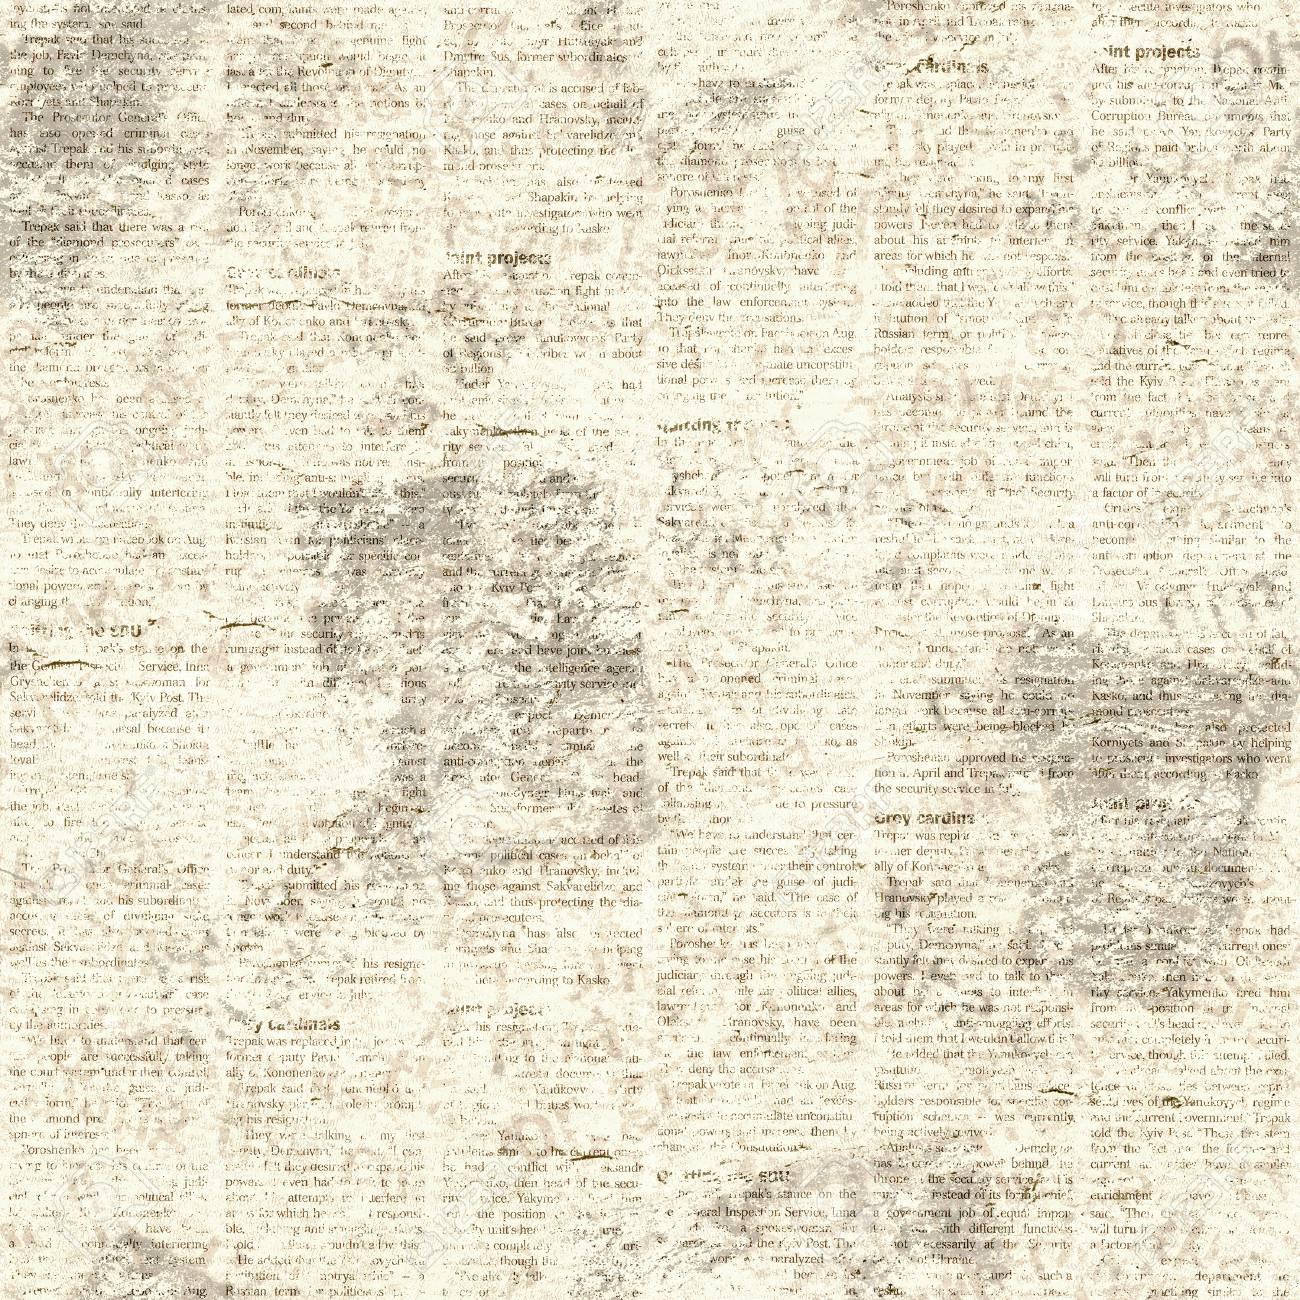 newspaper old grunge collage seamless pattern. unreadable vintage